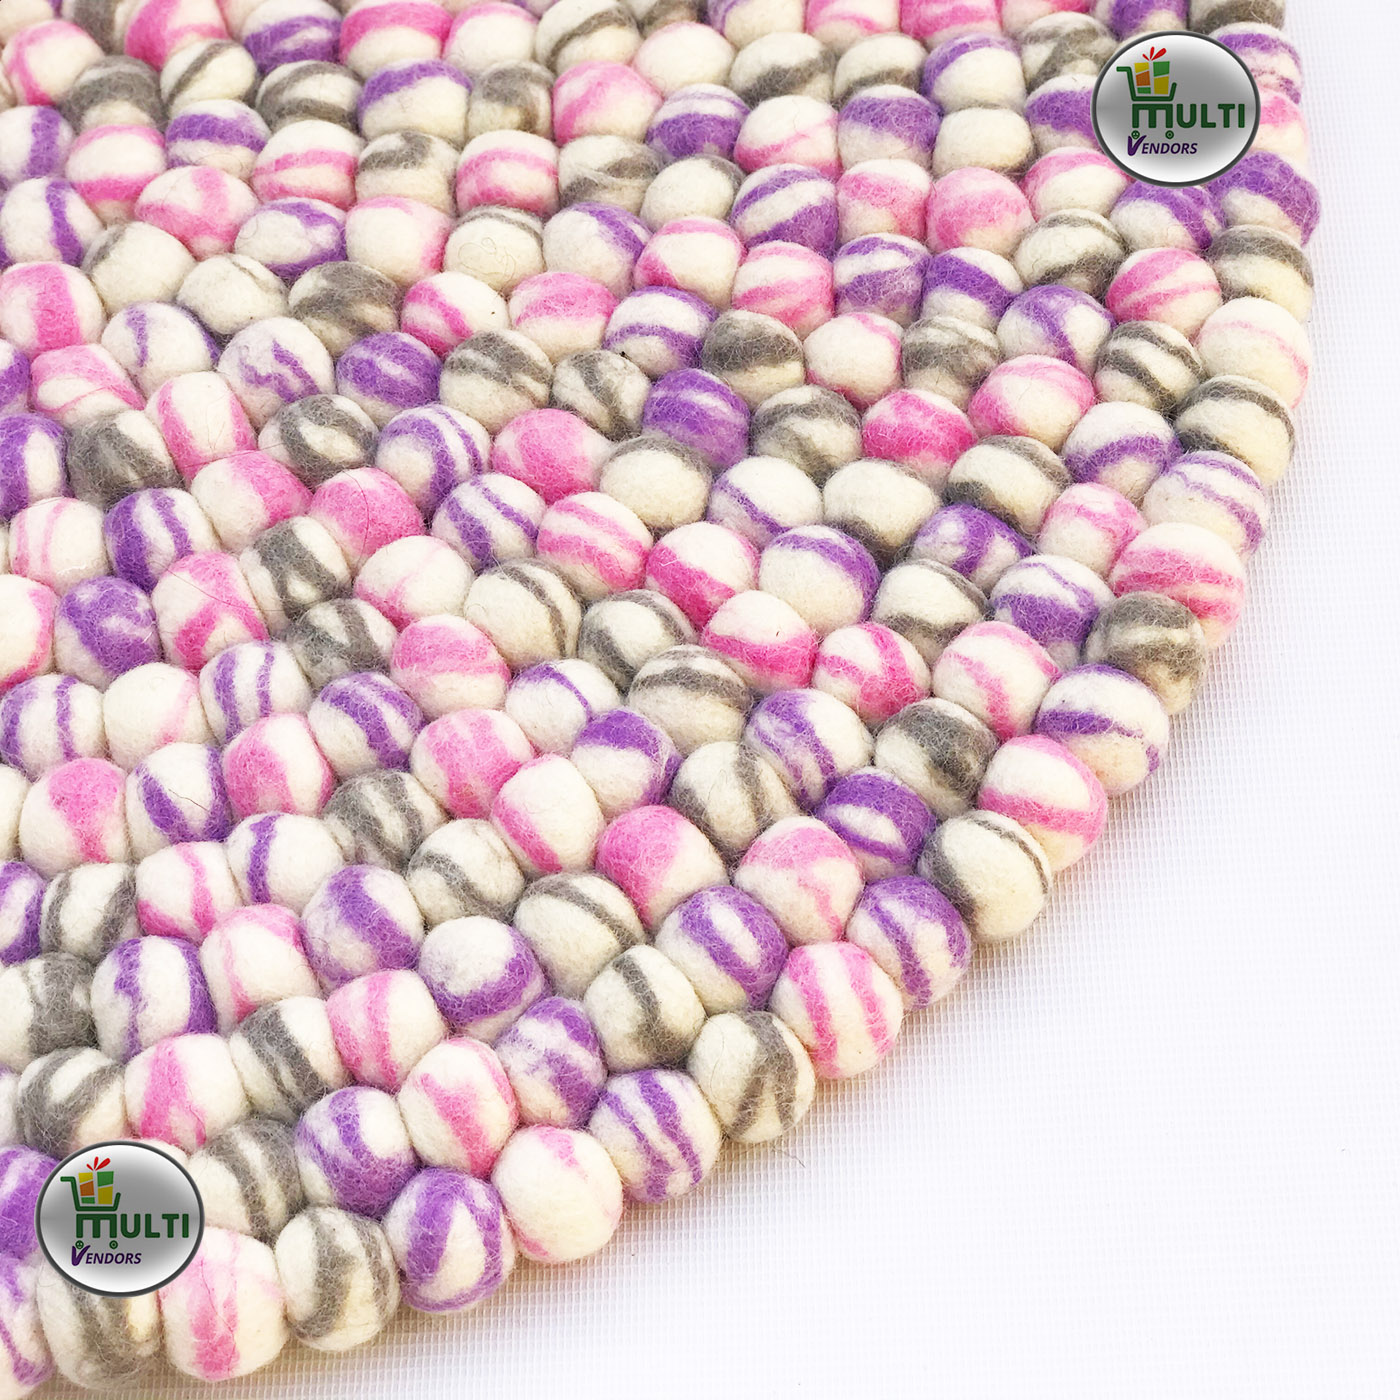 Round Marble Pebbles Design Felt Rug - MVSEB-WP- 21522